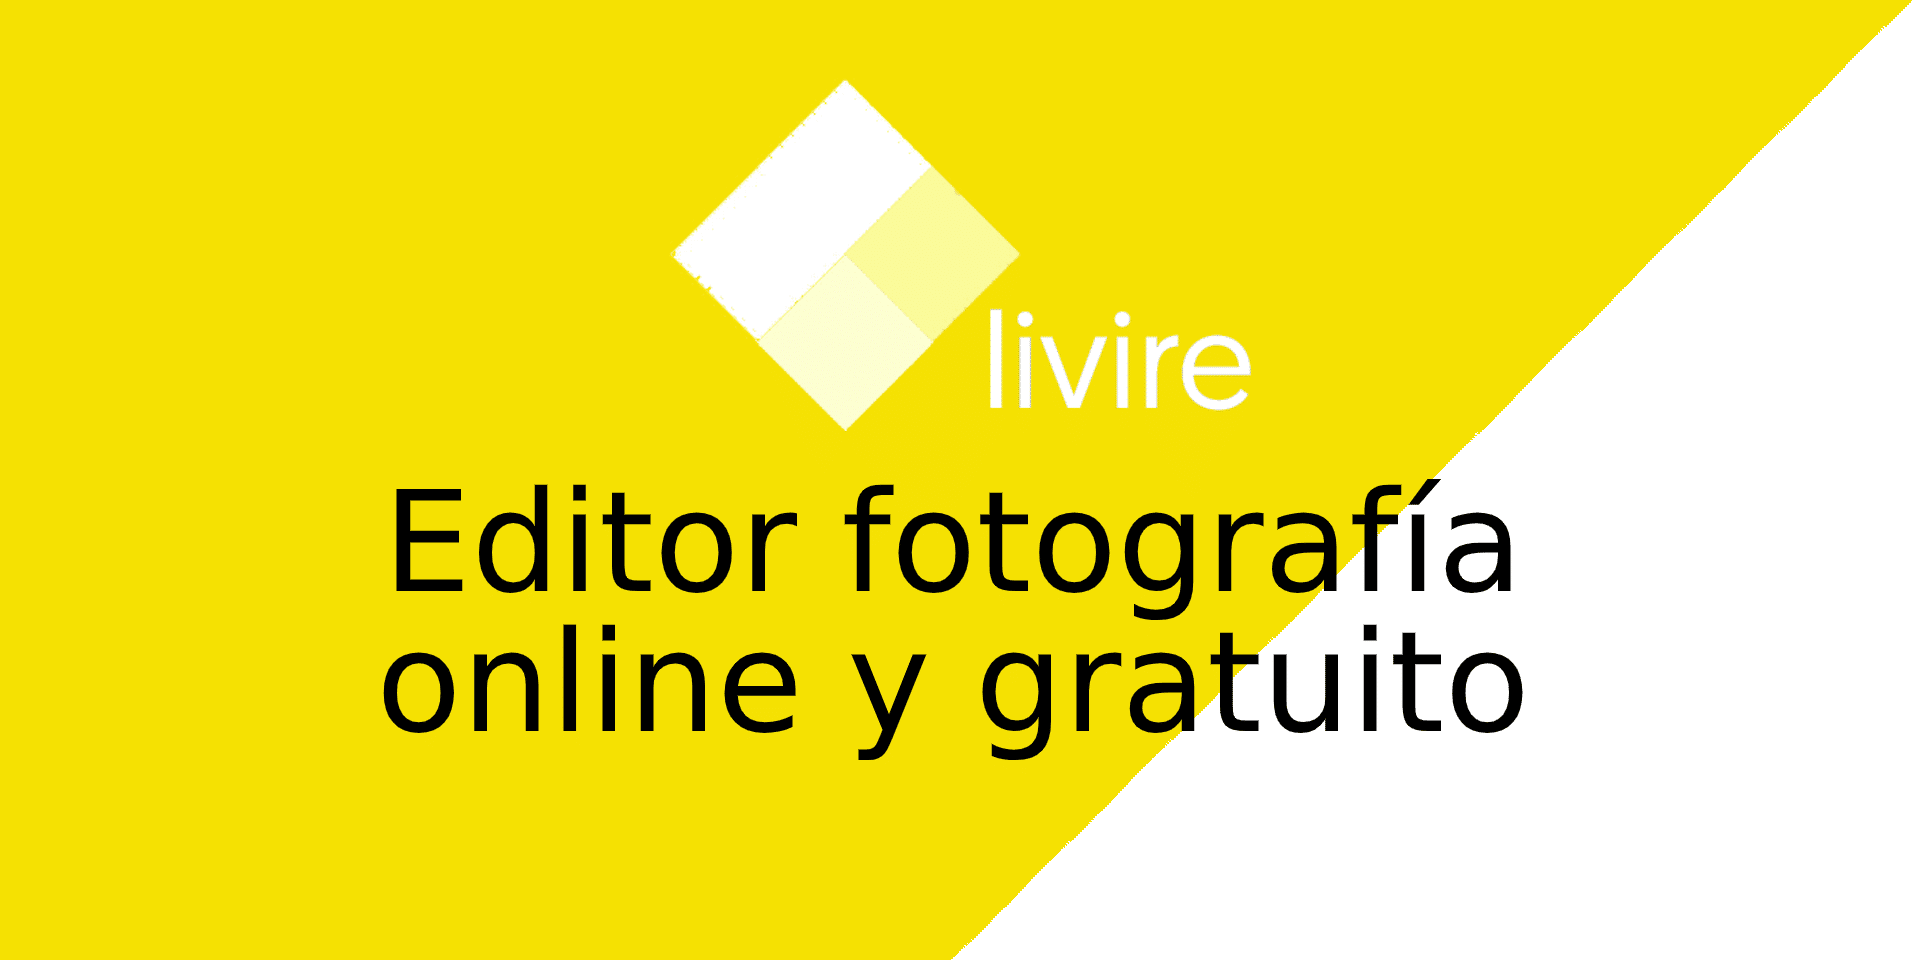 Editor de fotografia gratuito